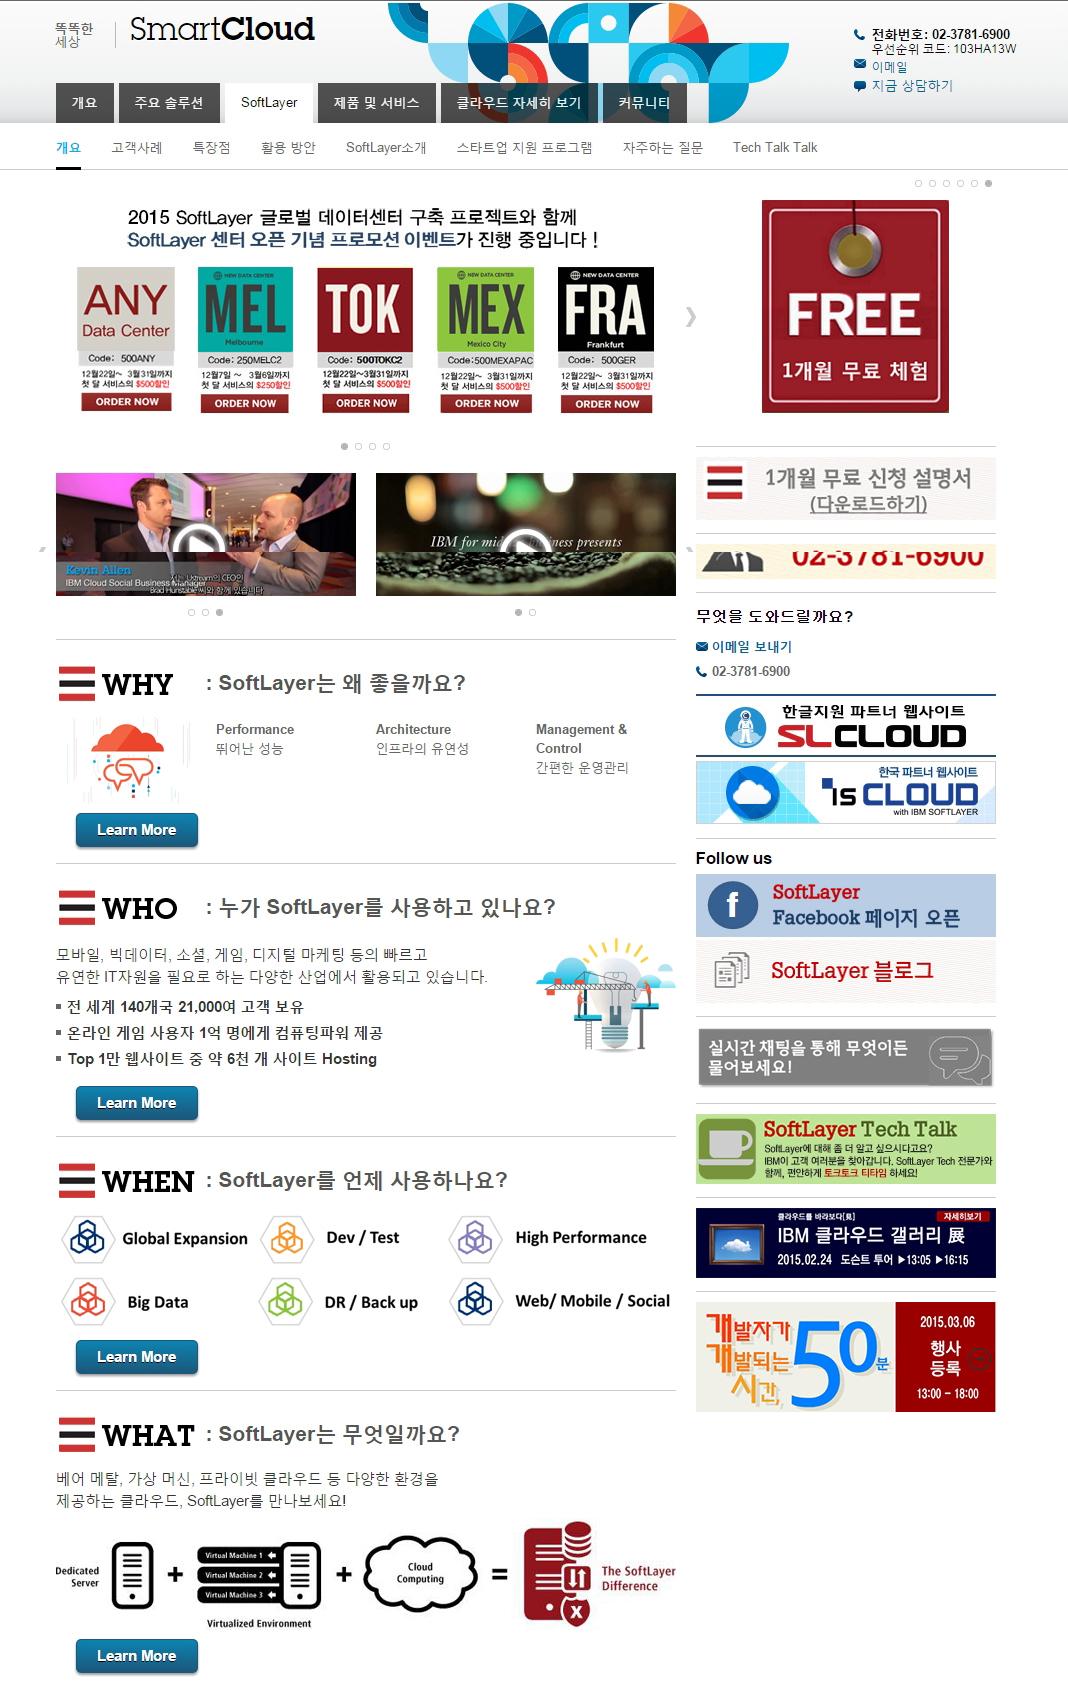 SoftLayer IBM Korea